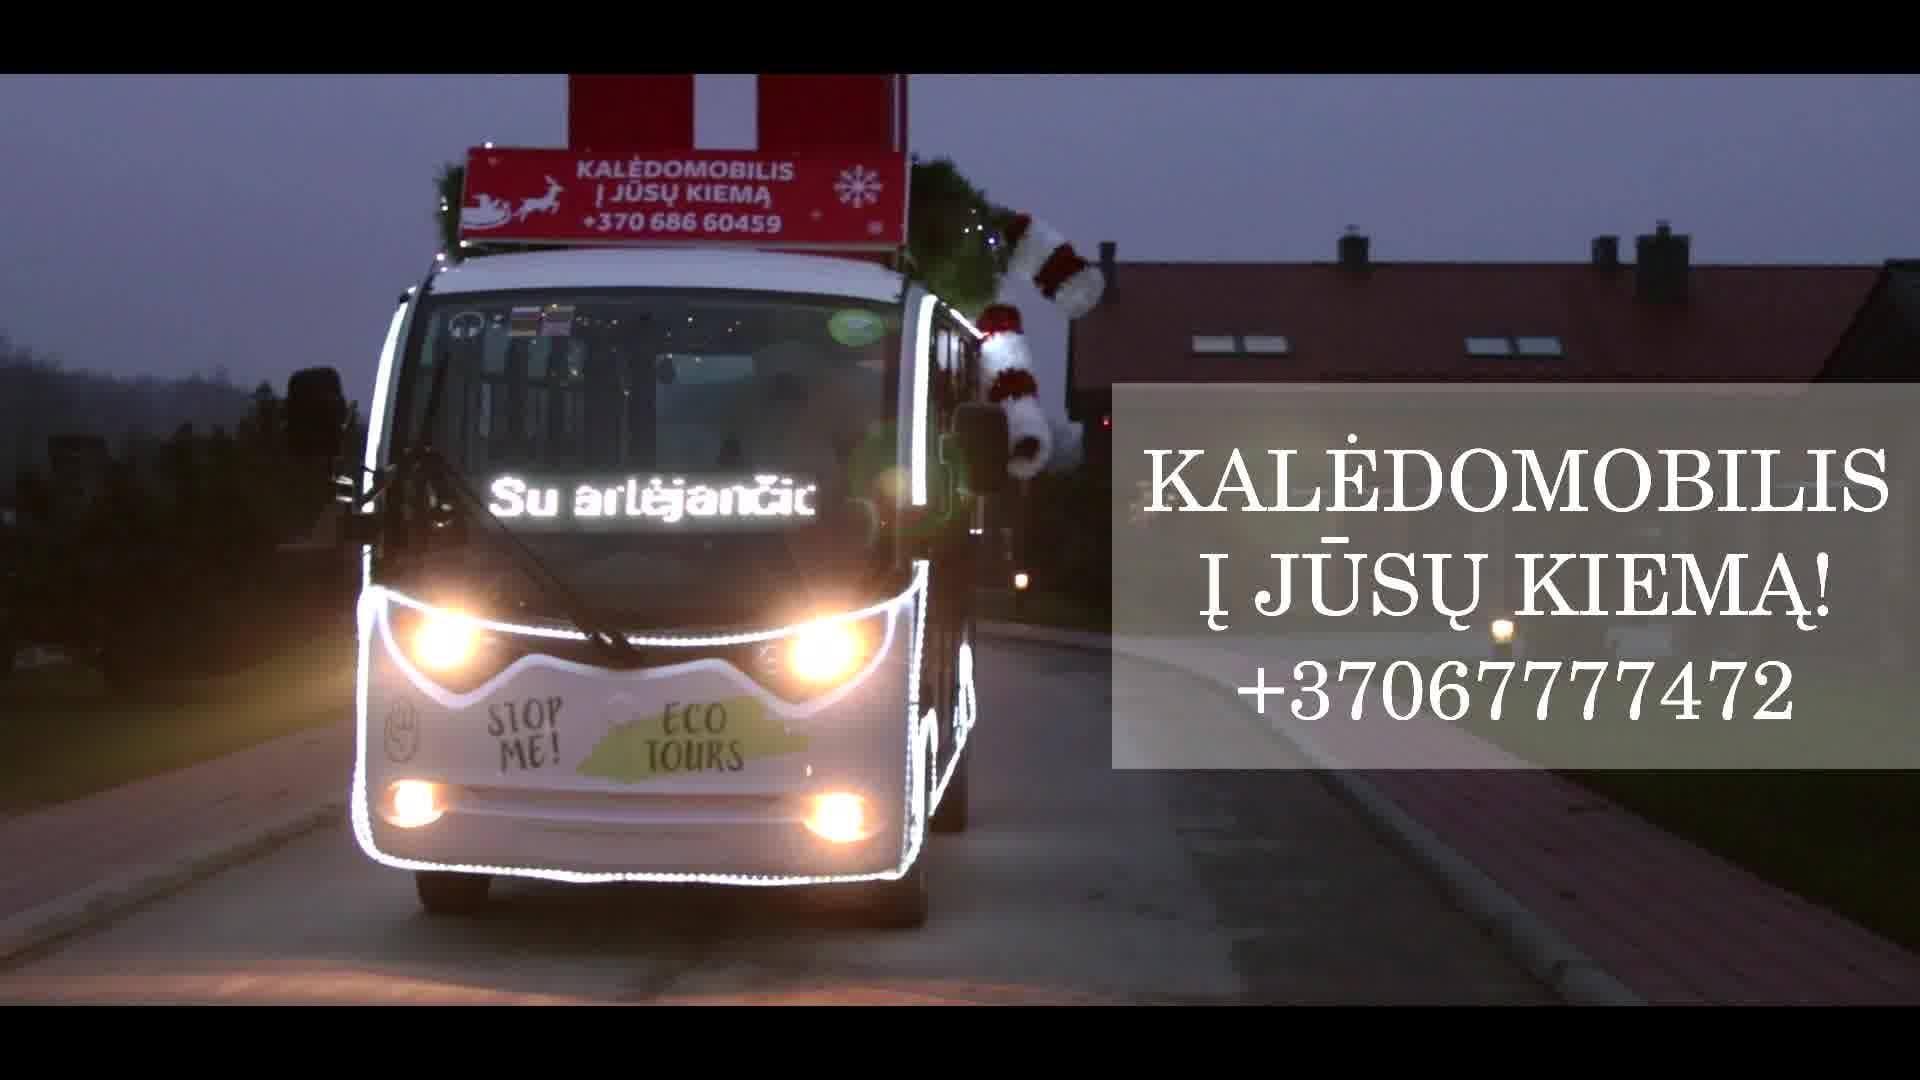 kaledomobilis